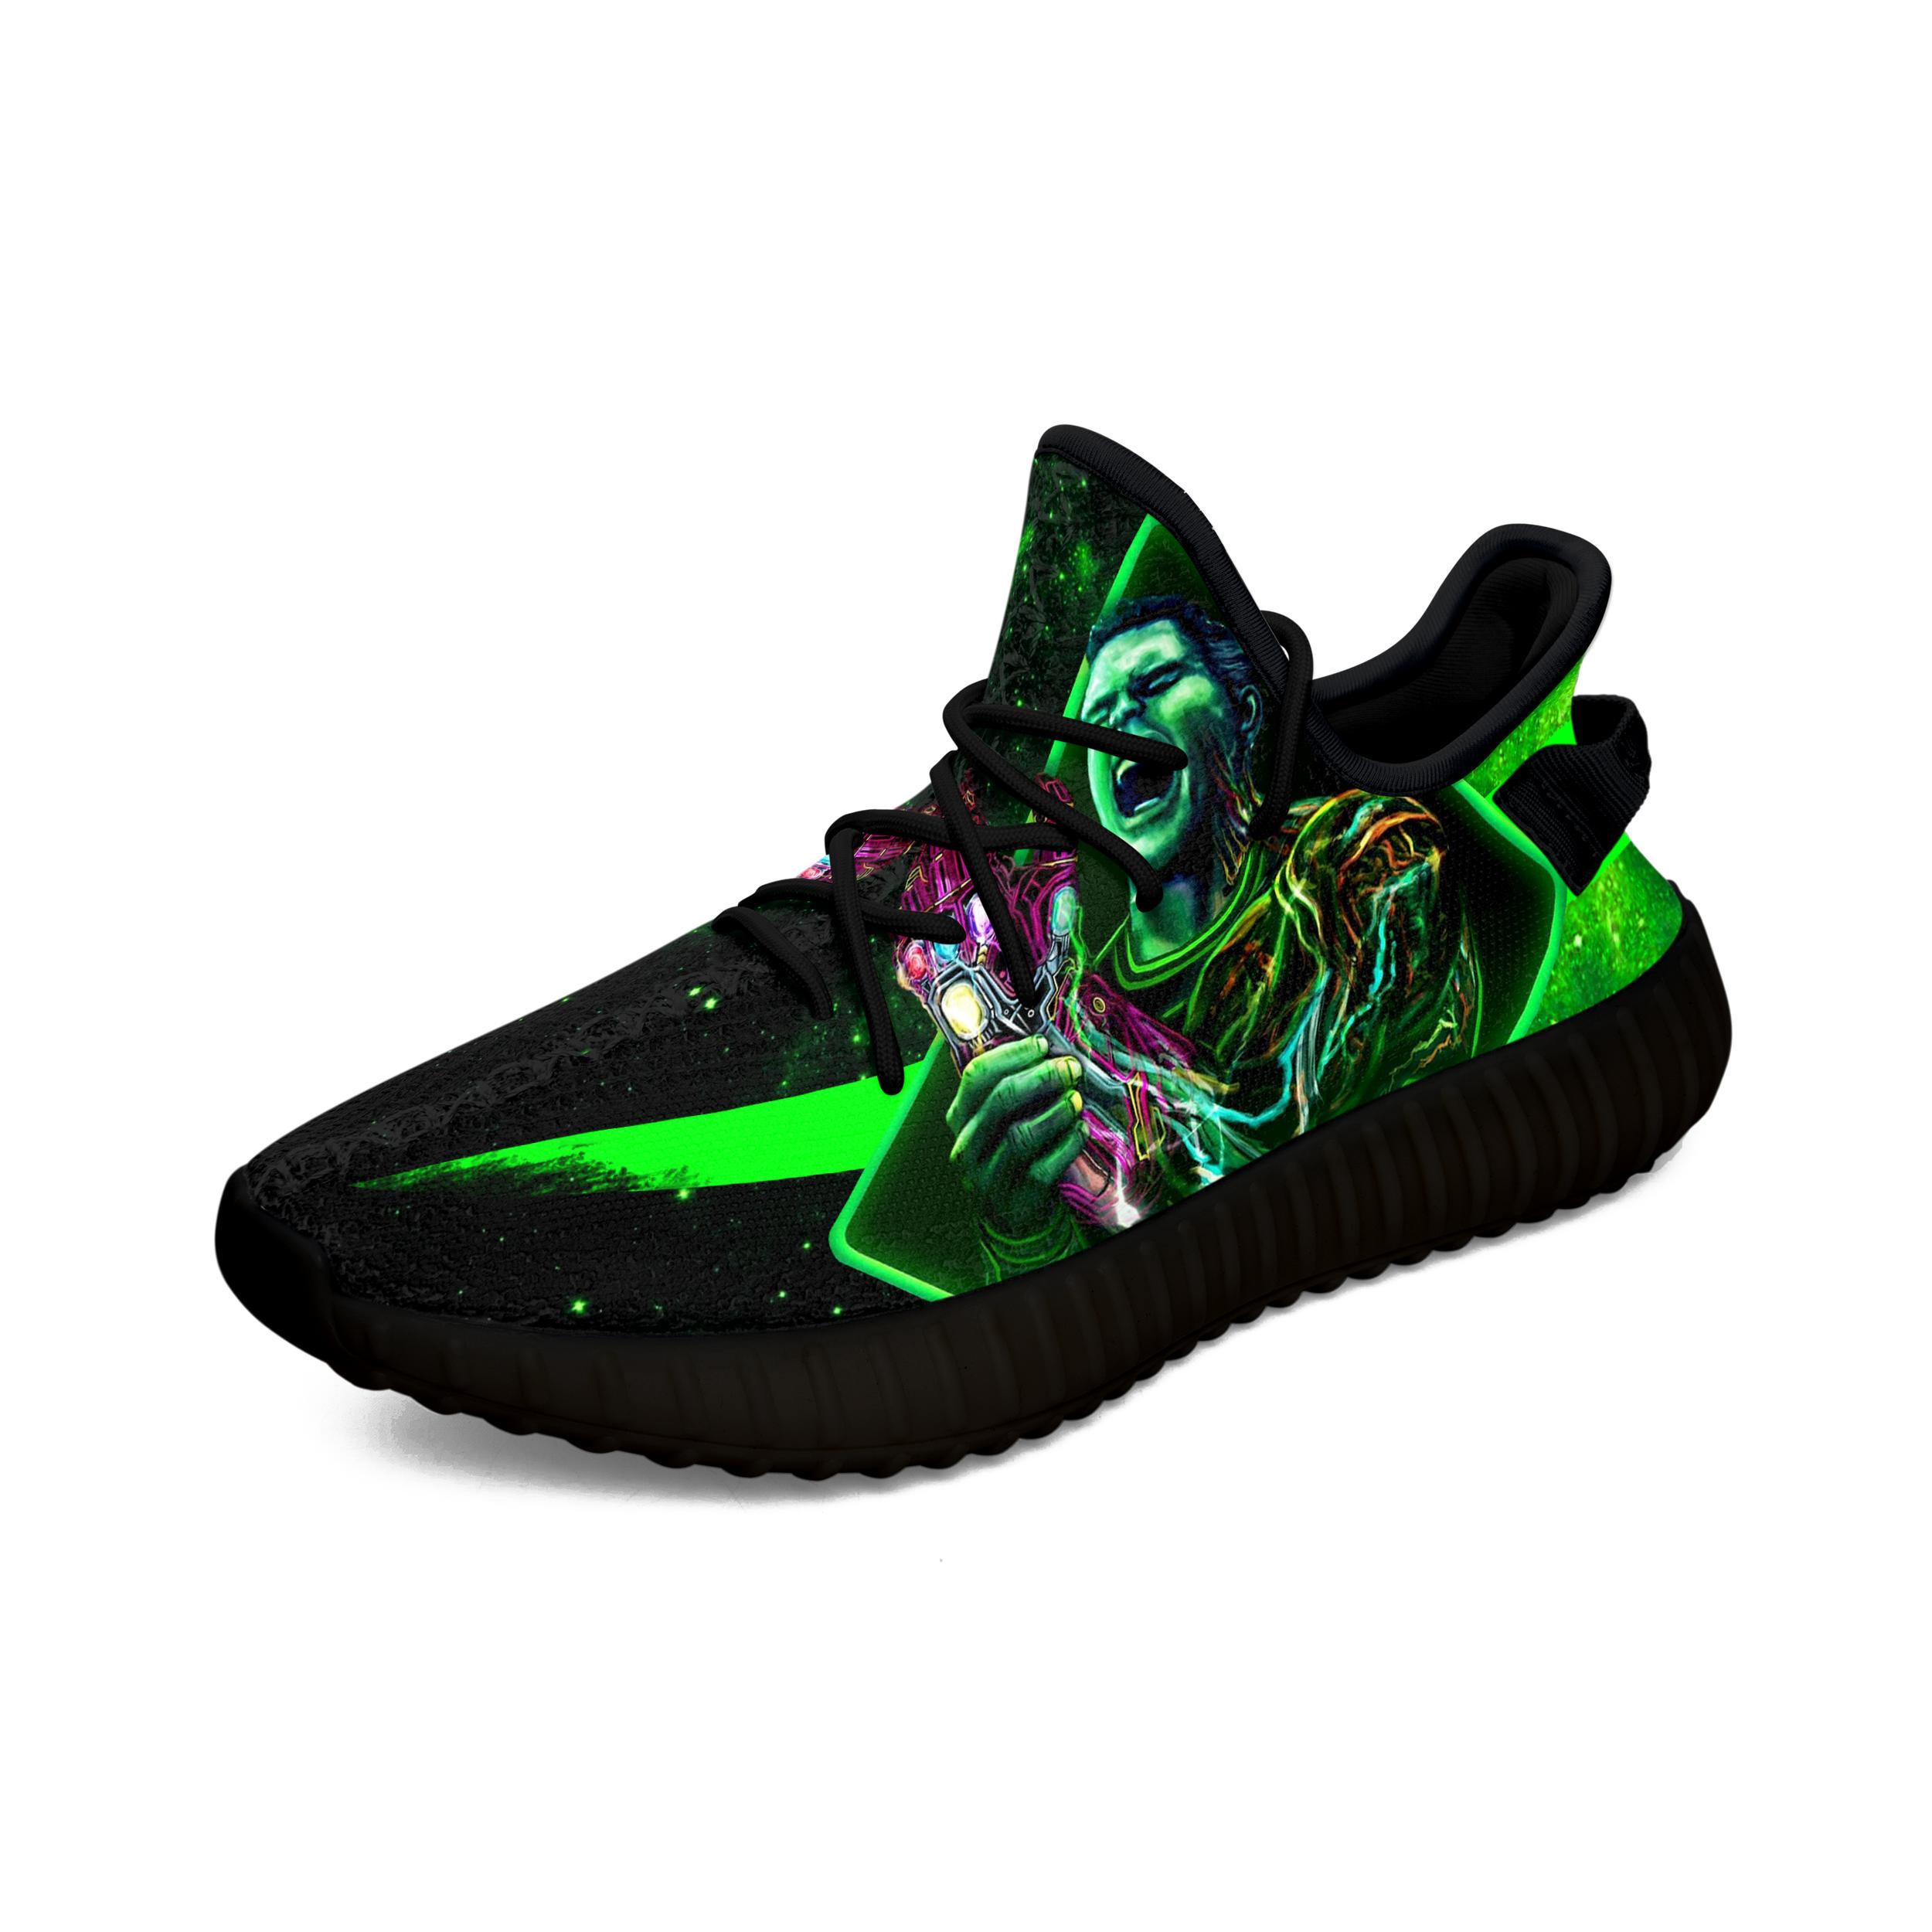 190705 ? Hulk Yeezy Boots